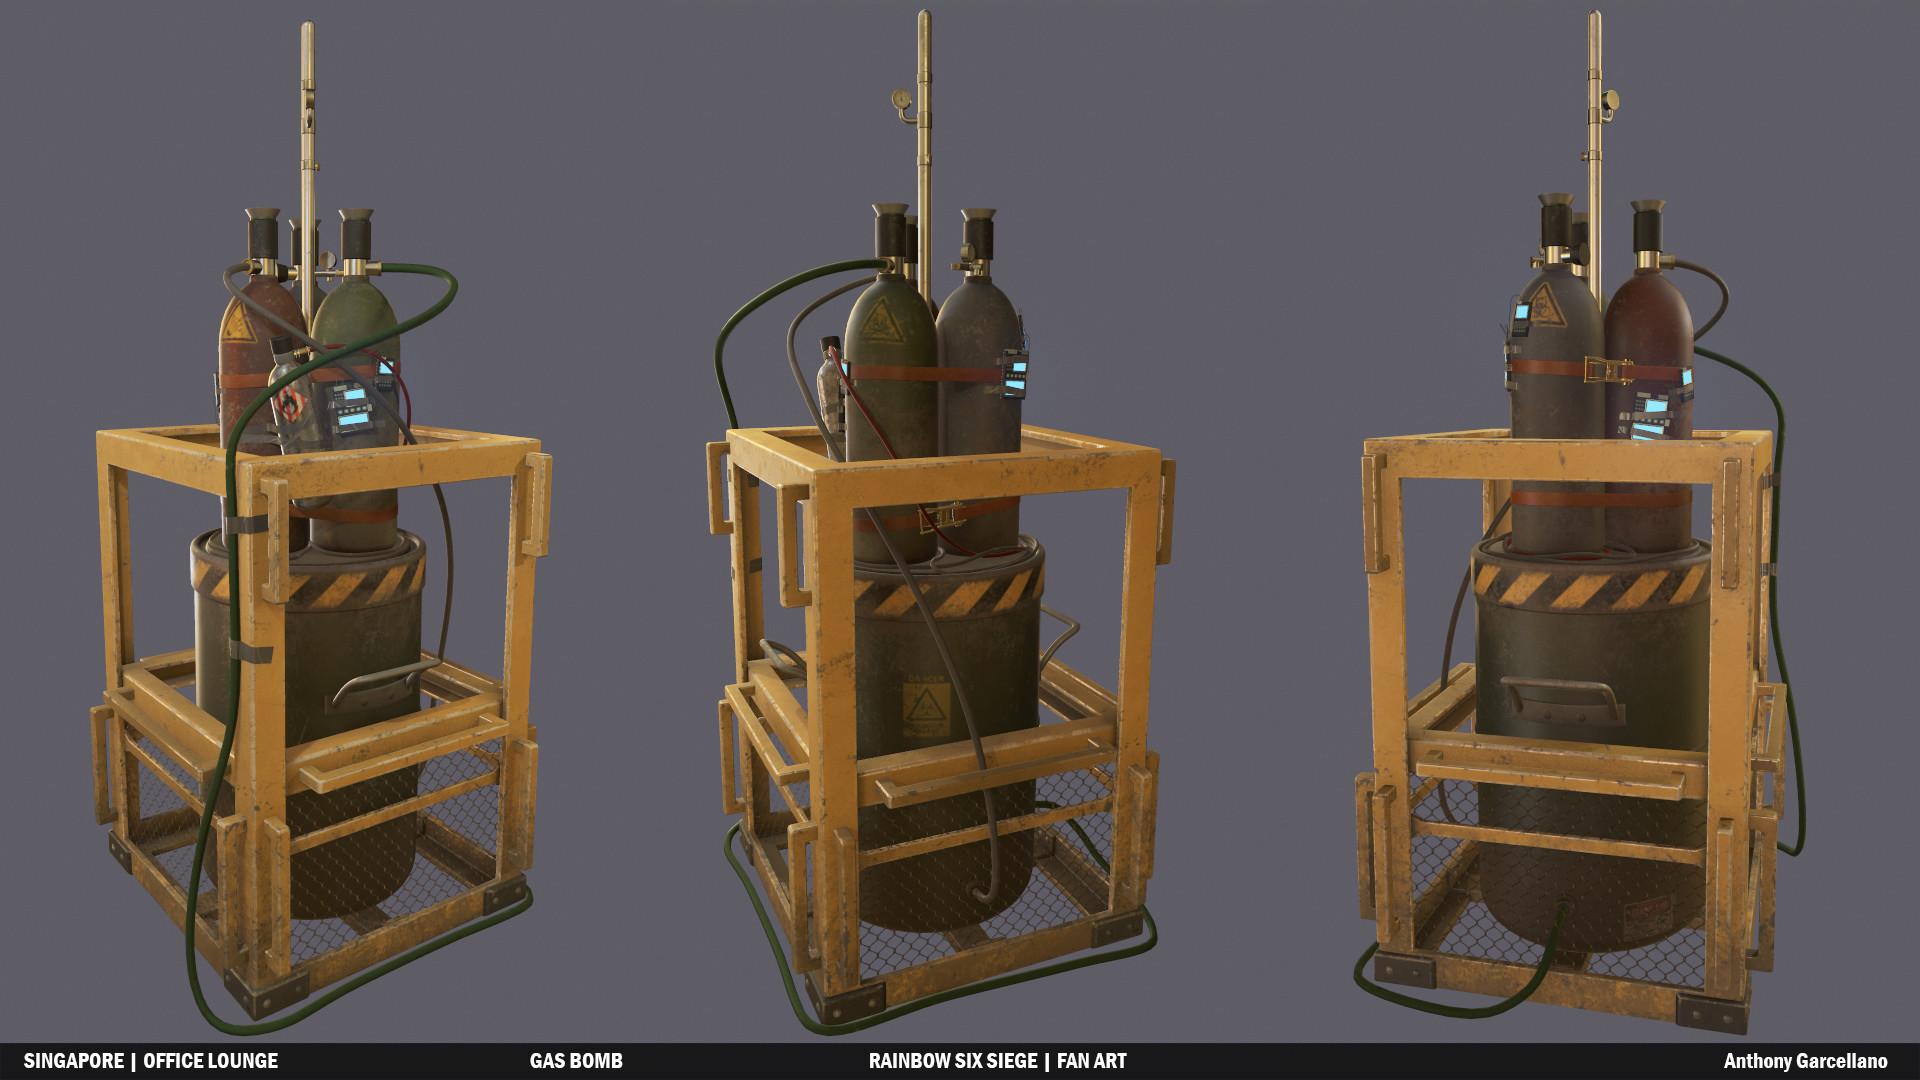 ArtStation - Gas Bomb | Rainbow Six Siege Fan Art, Anthony